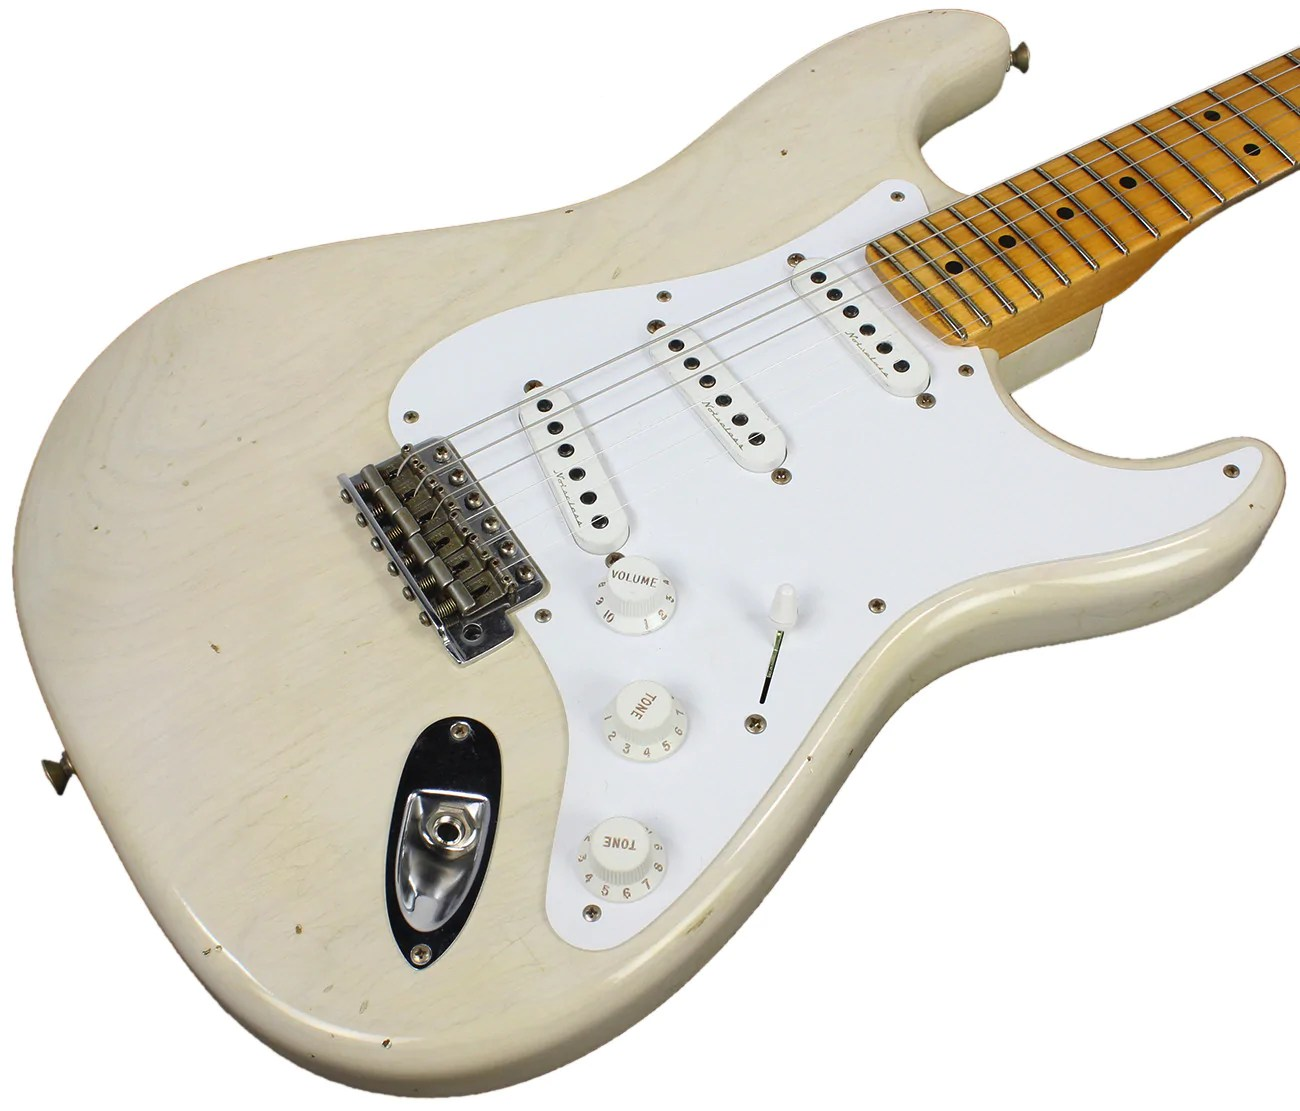 medium resolution of fender custom shop eric clapton journeyman stratocaster relic guitar aged white blonde humbucker music